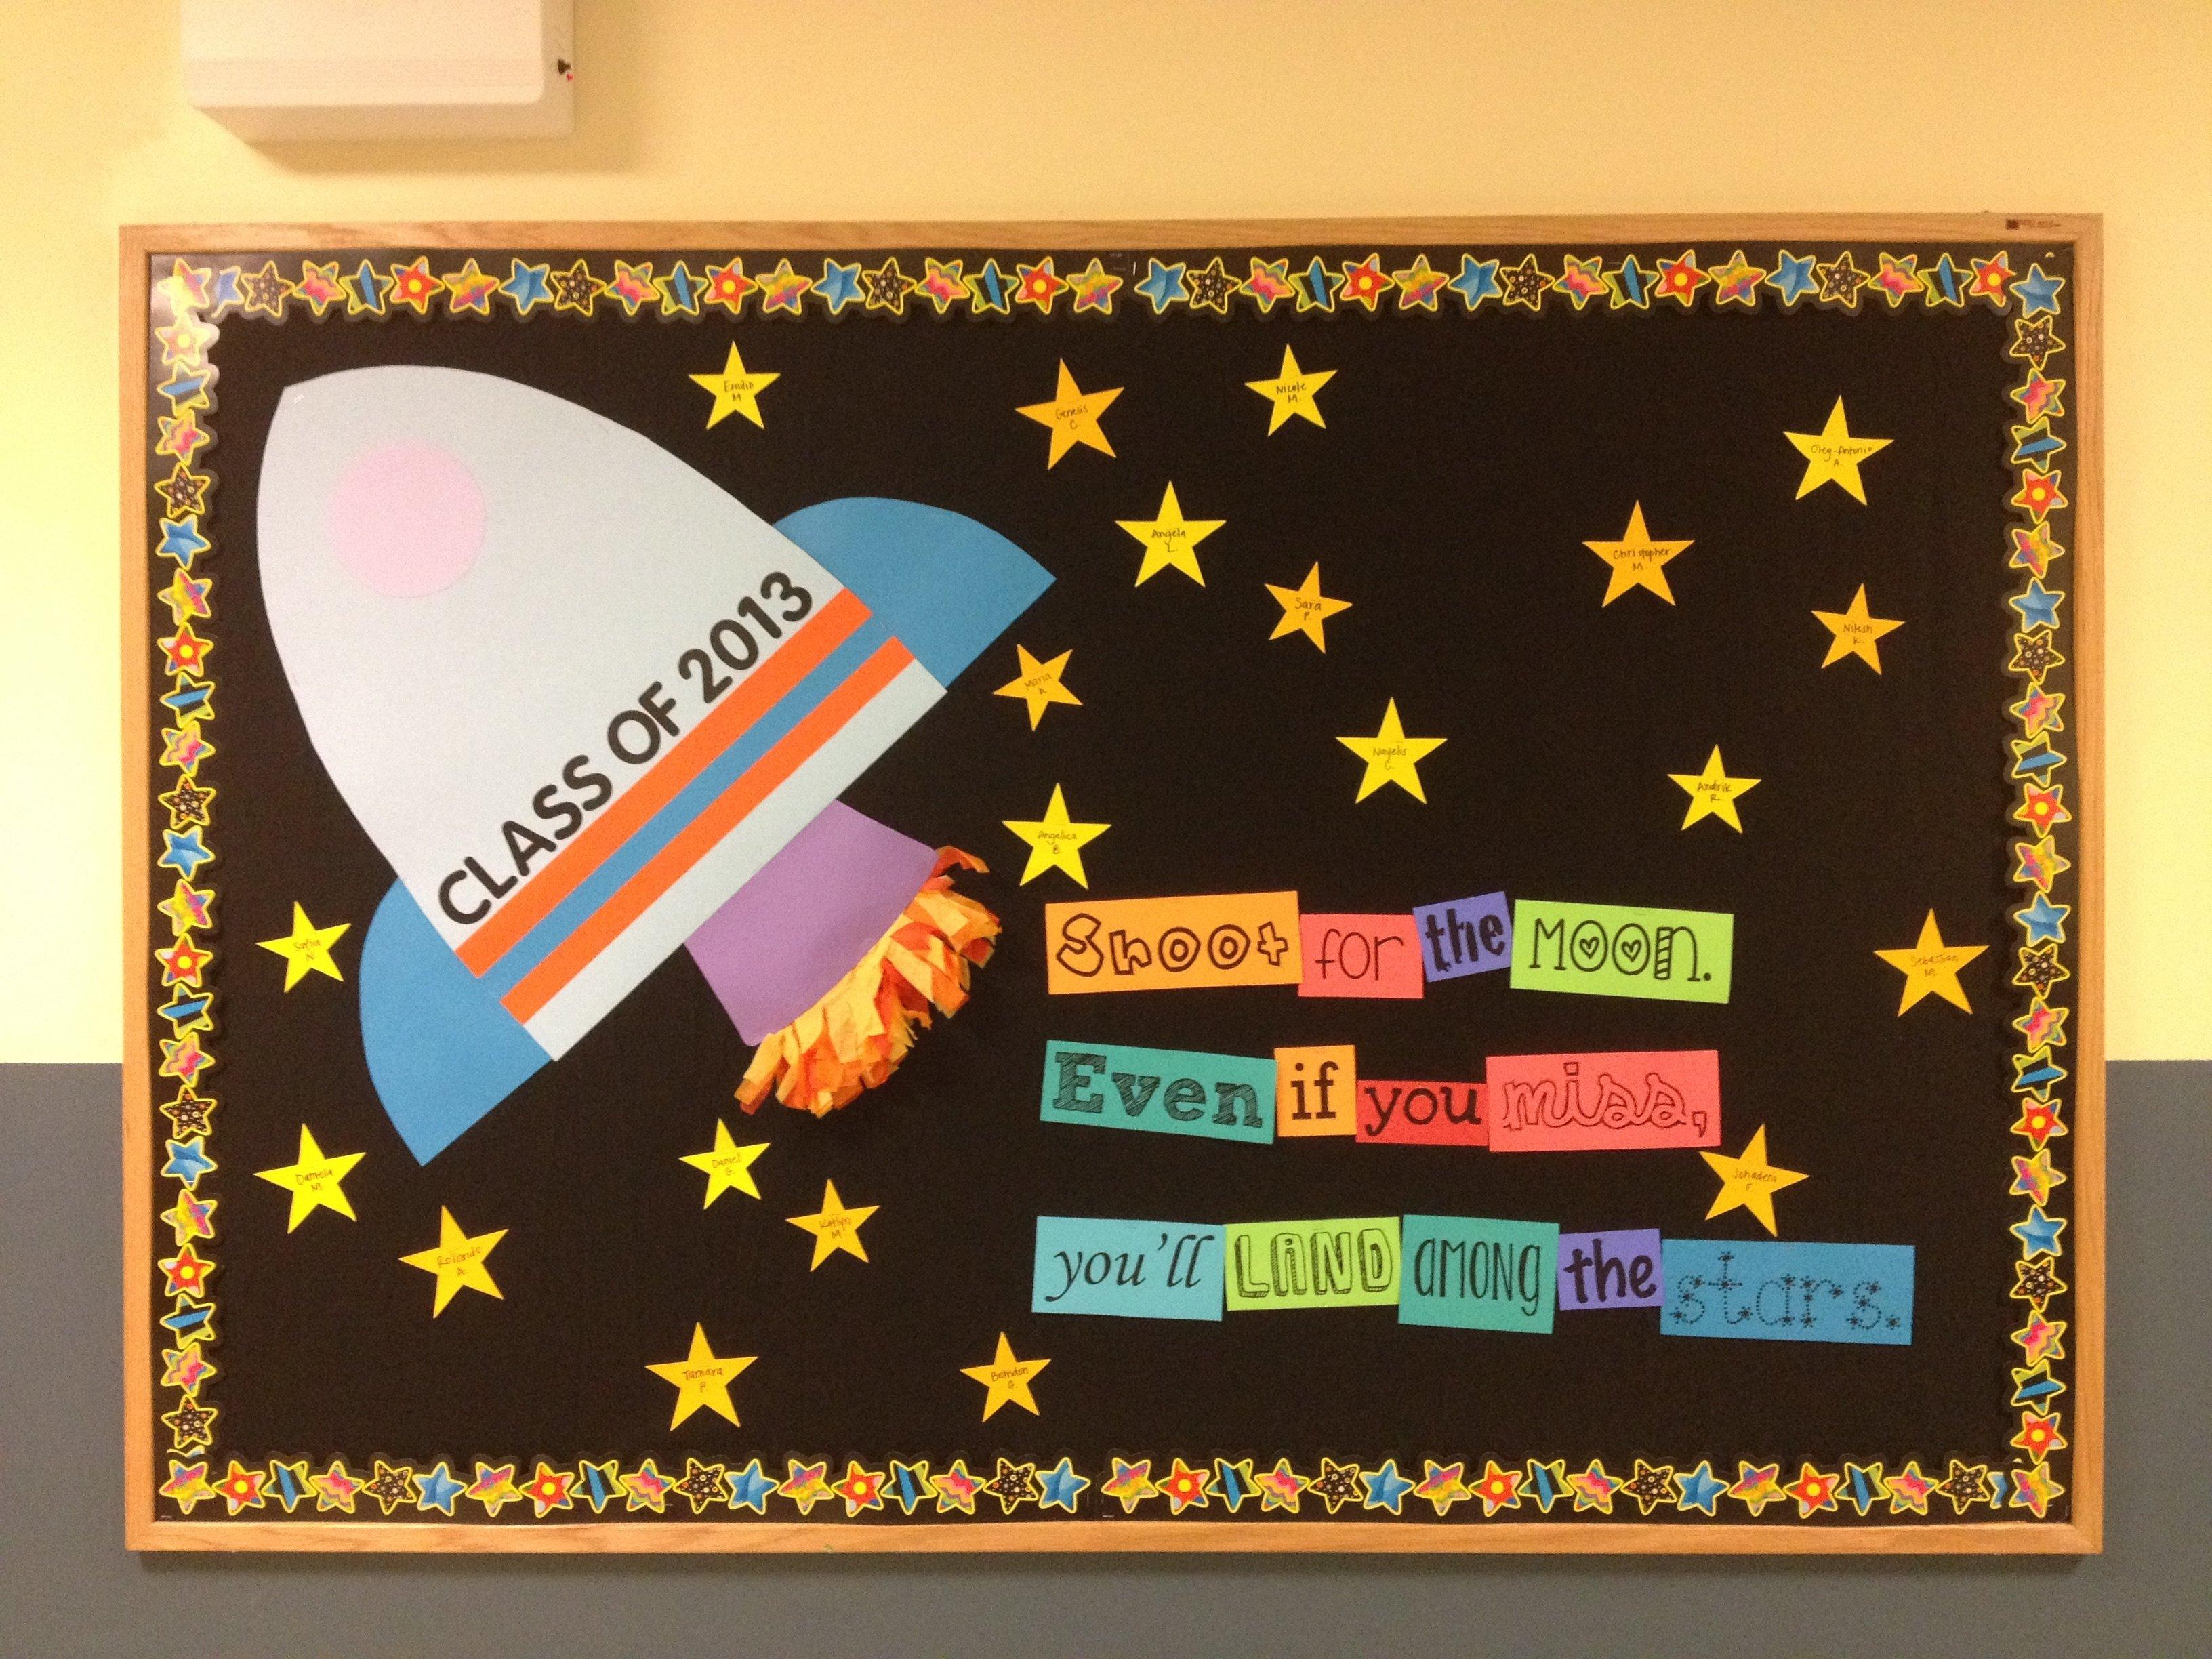 10 Wonderful Beginning Of The Year Bulletin Board Ideas shoot for the moon bulletin board 5th grade back to school 8 2021